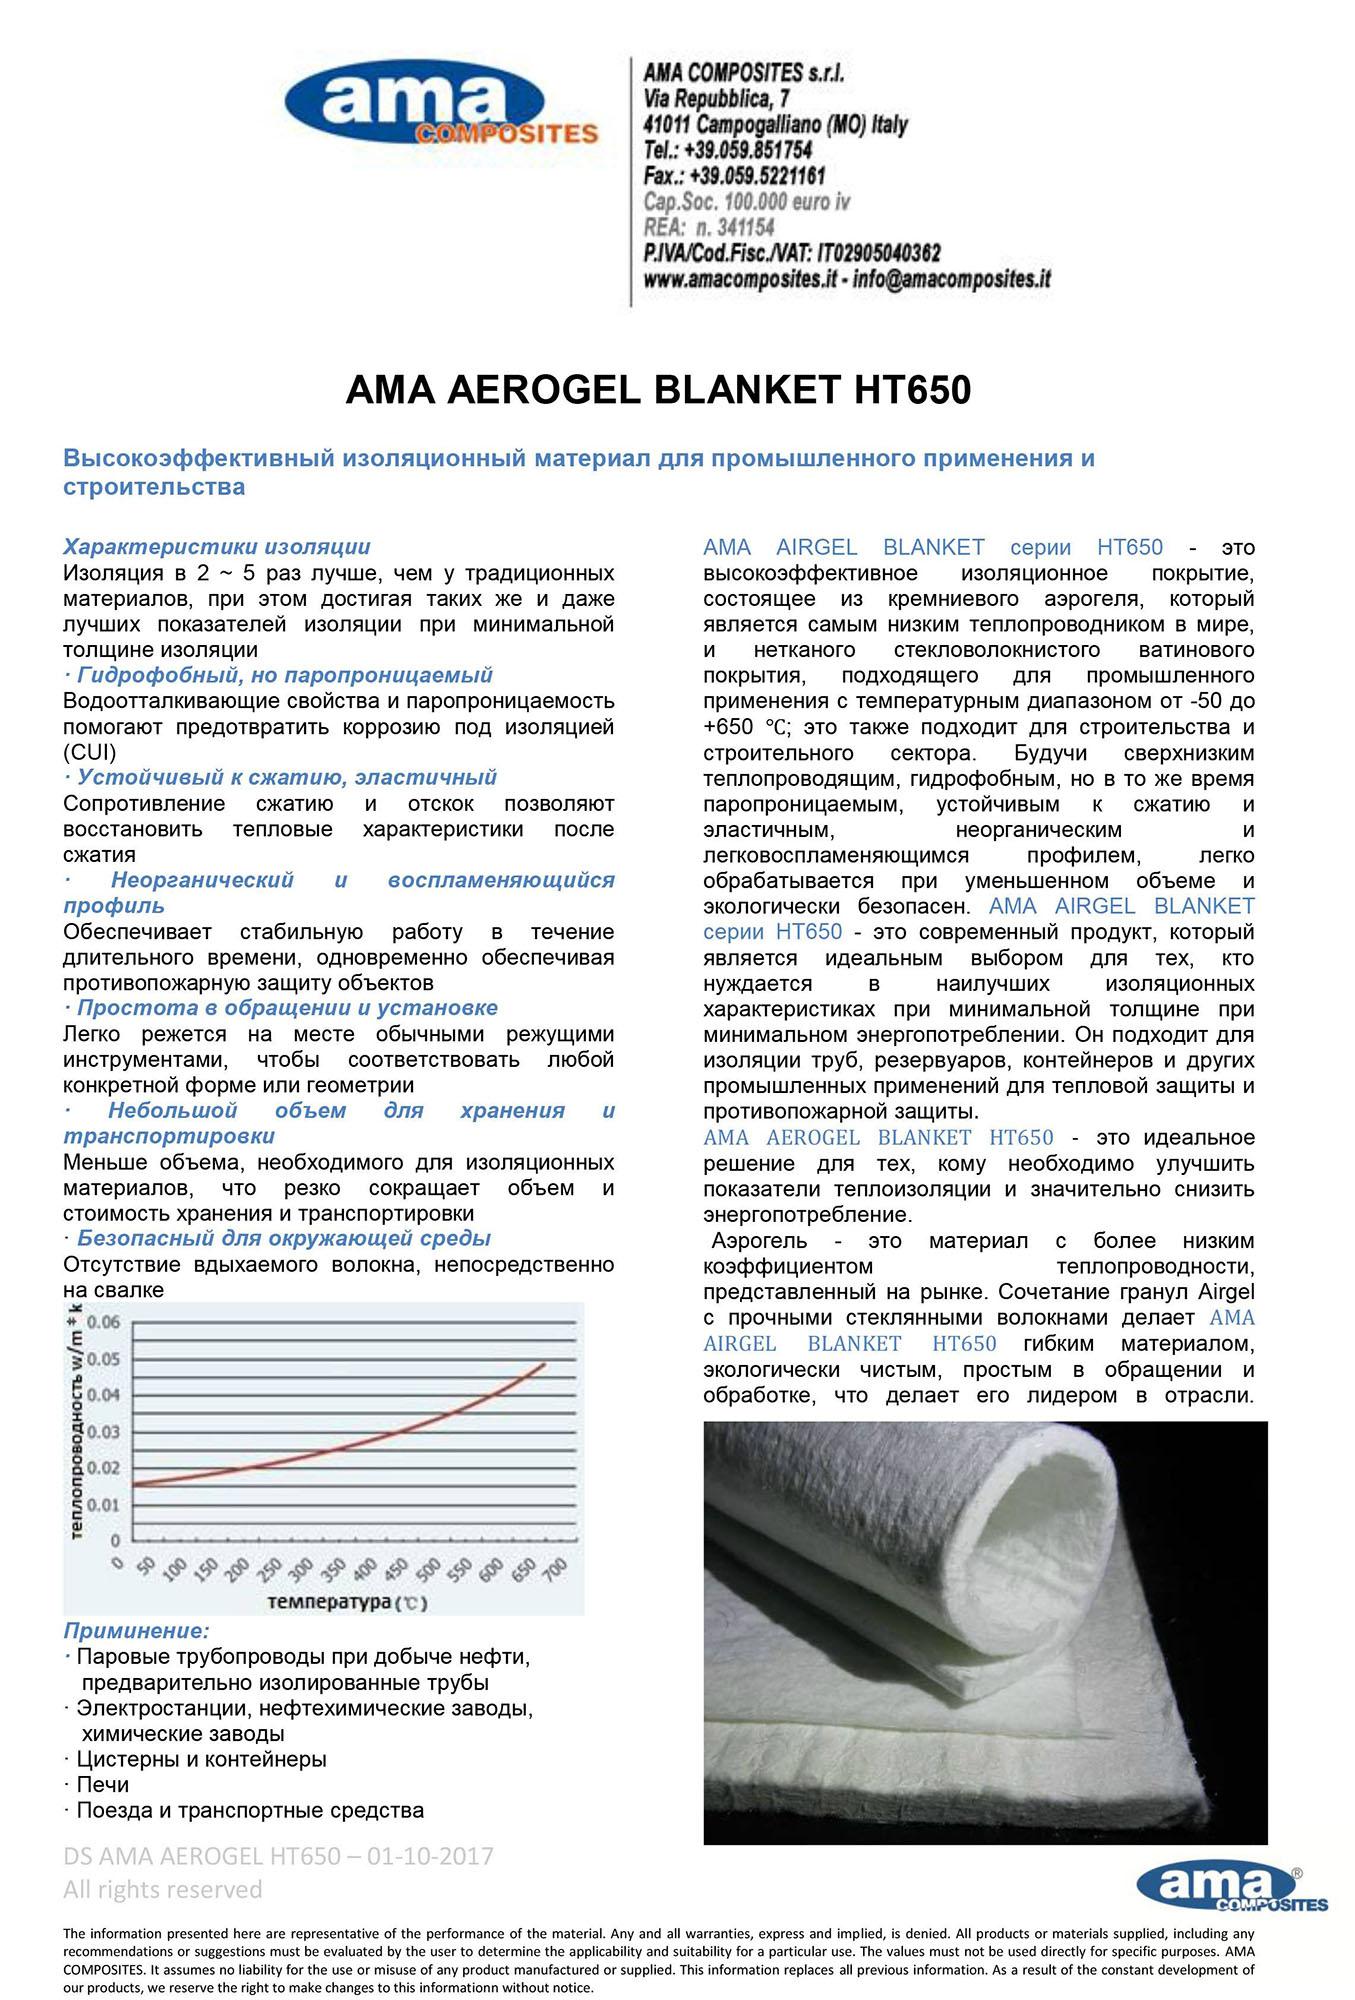 AMA AEROGEL BLANKET HT650 RU